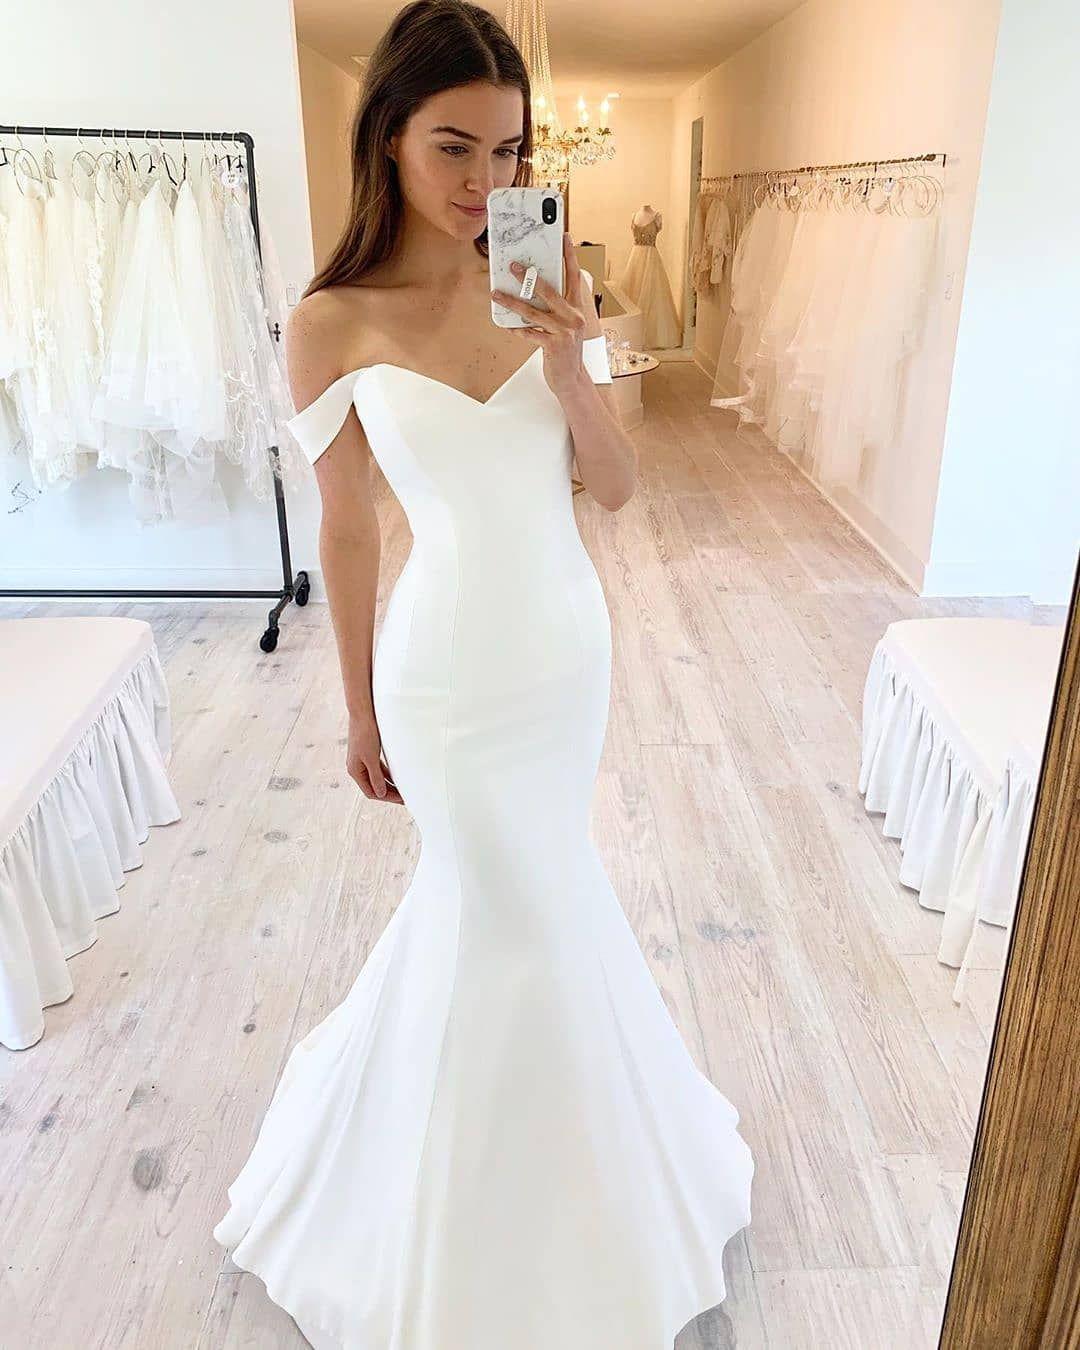 Wd0741 Elegant Mermaid Sweetheart Satin Wedding Dresses On Storenvy Wedding Dress Material Wedding Dresses Satin Satin Wedding [ 1350 x 1080 Pixel ]